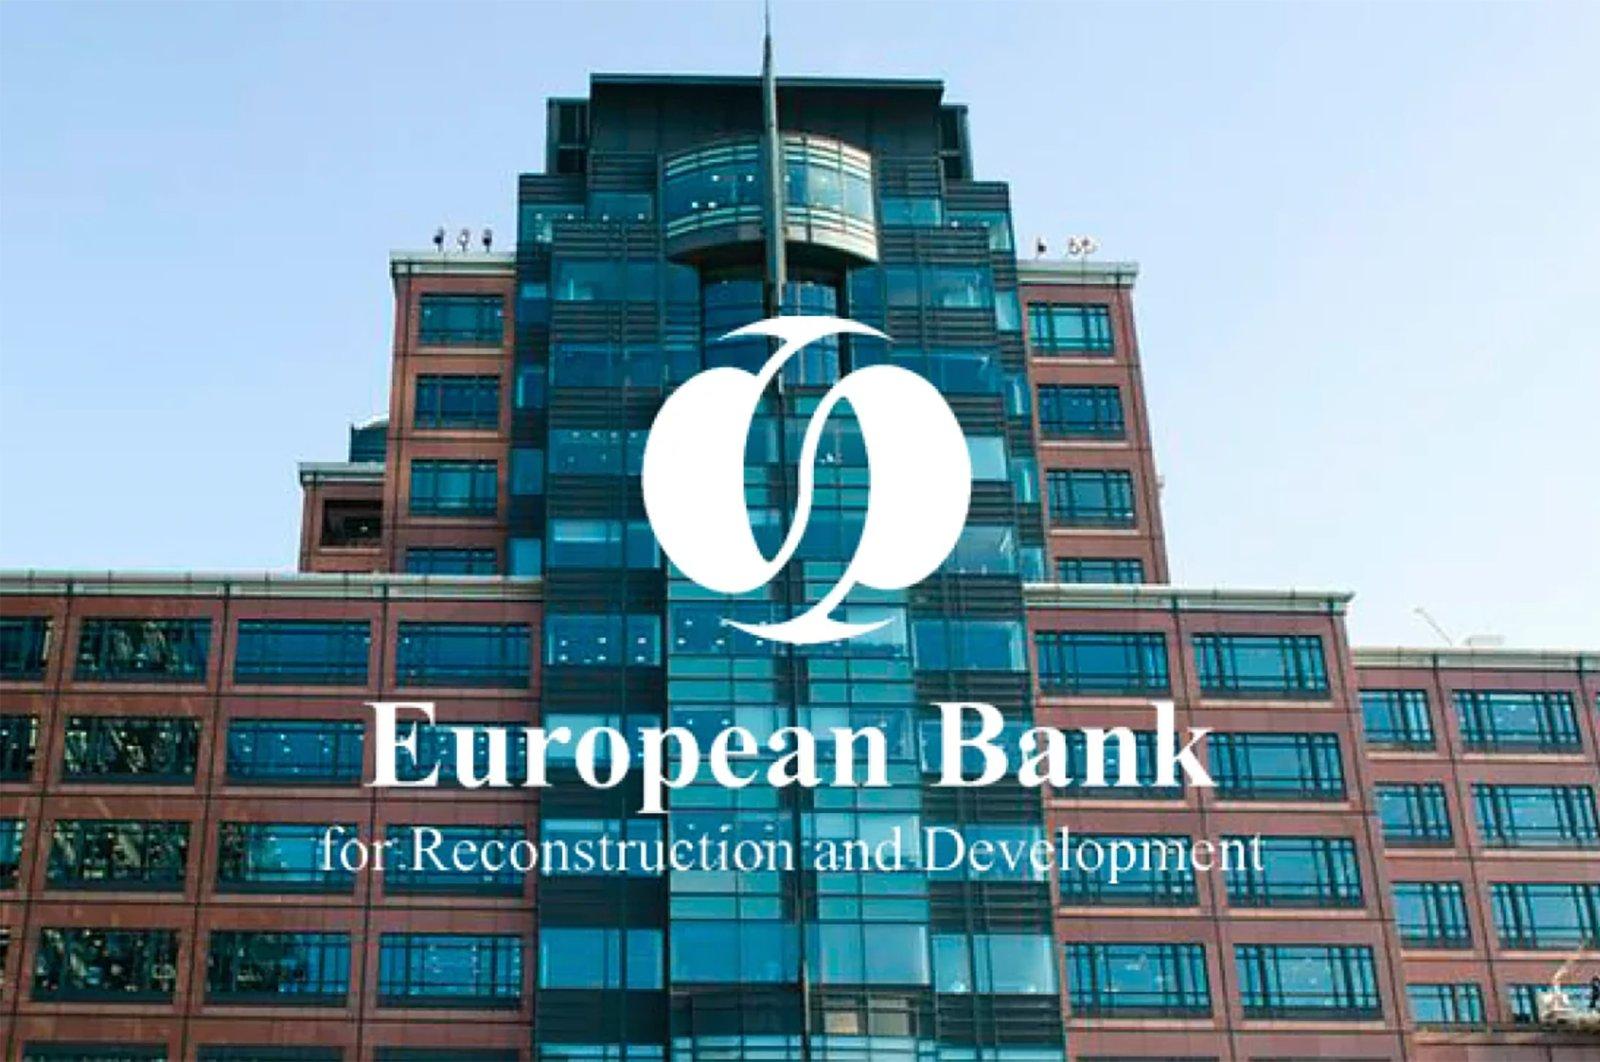 The European Bank for Reconstruction and Development (EBRD) building in London, U.K., June 18, 2020. (Sabah File Photo)